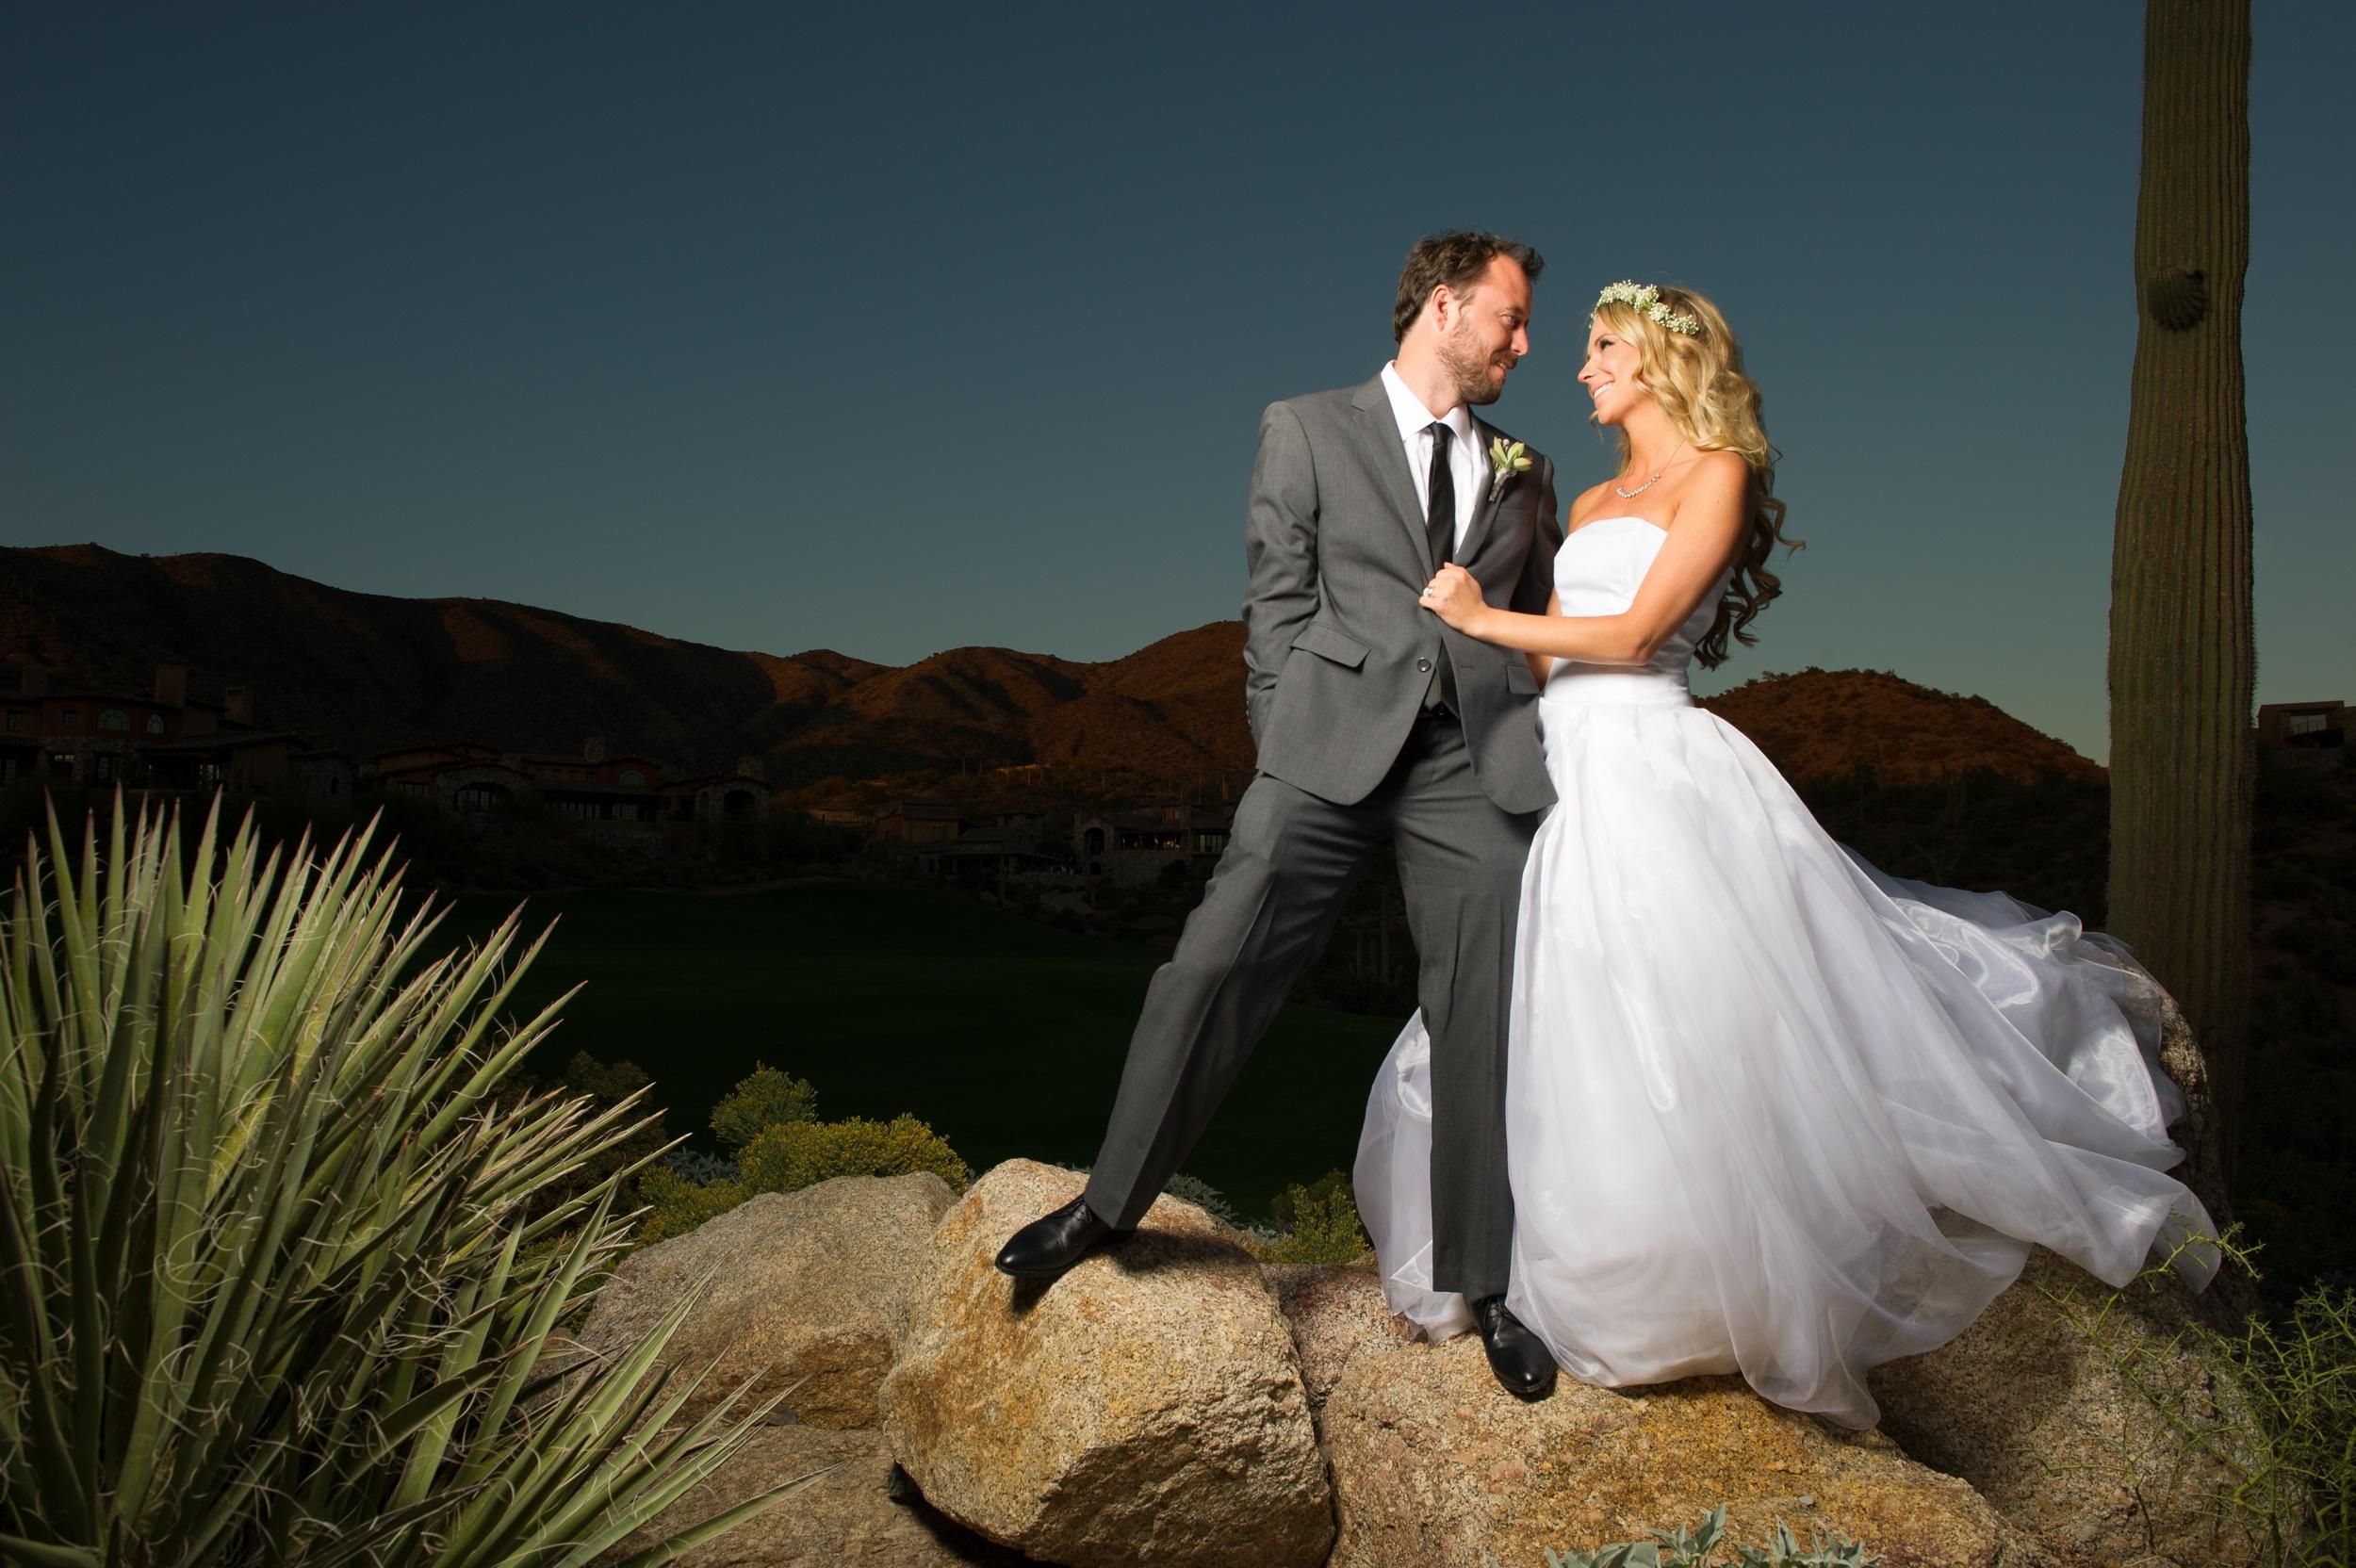 Kaylee and David